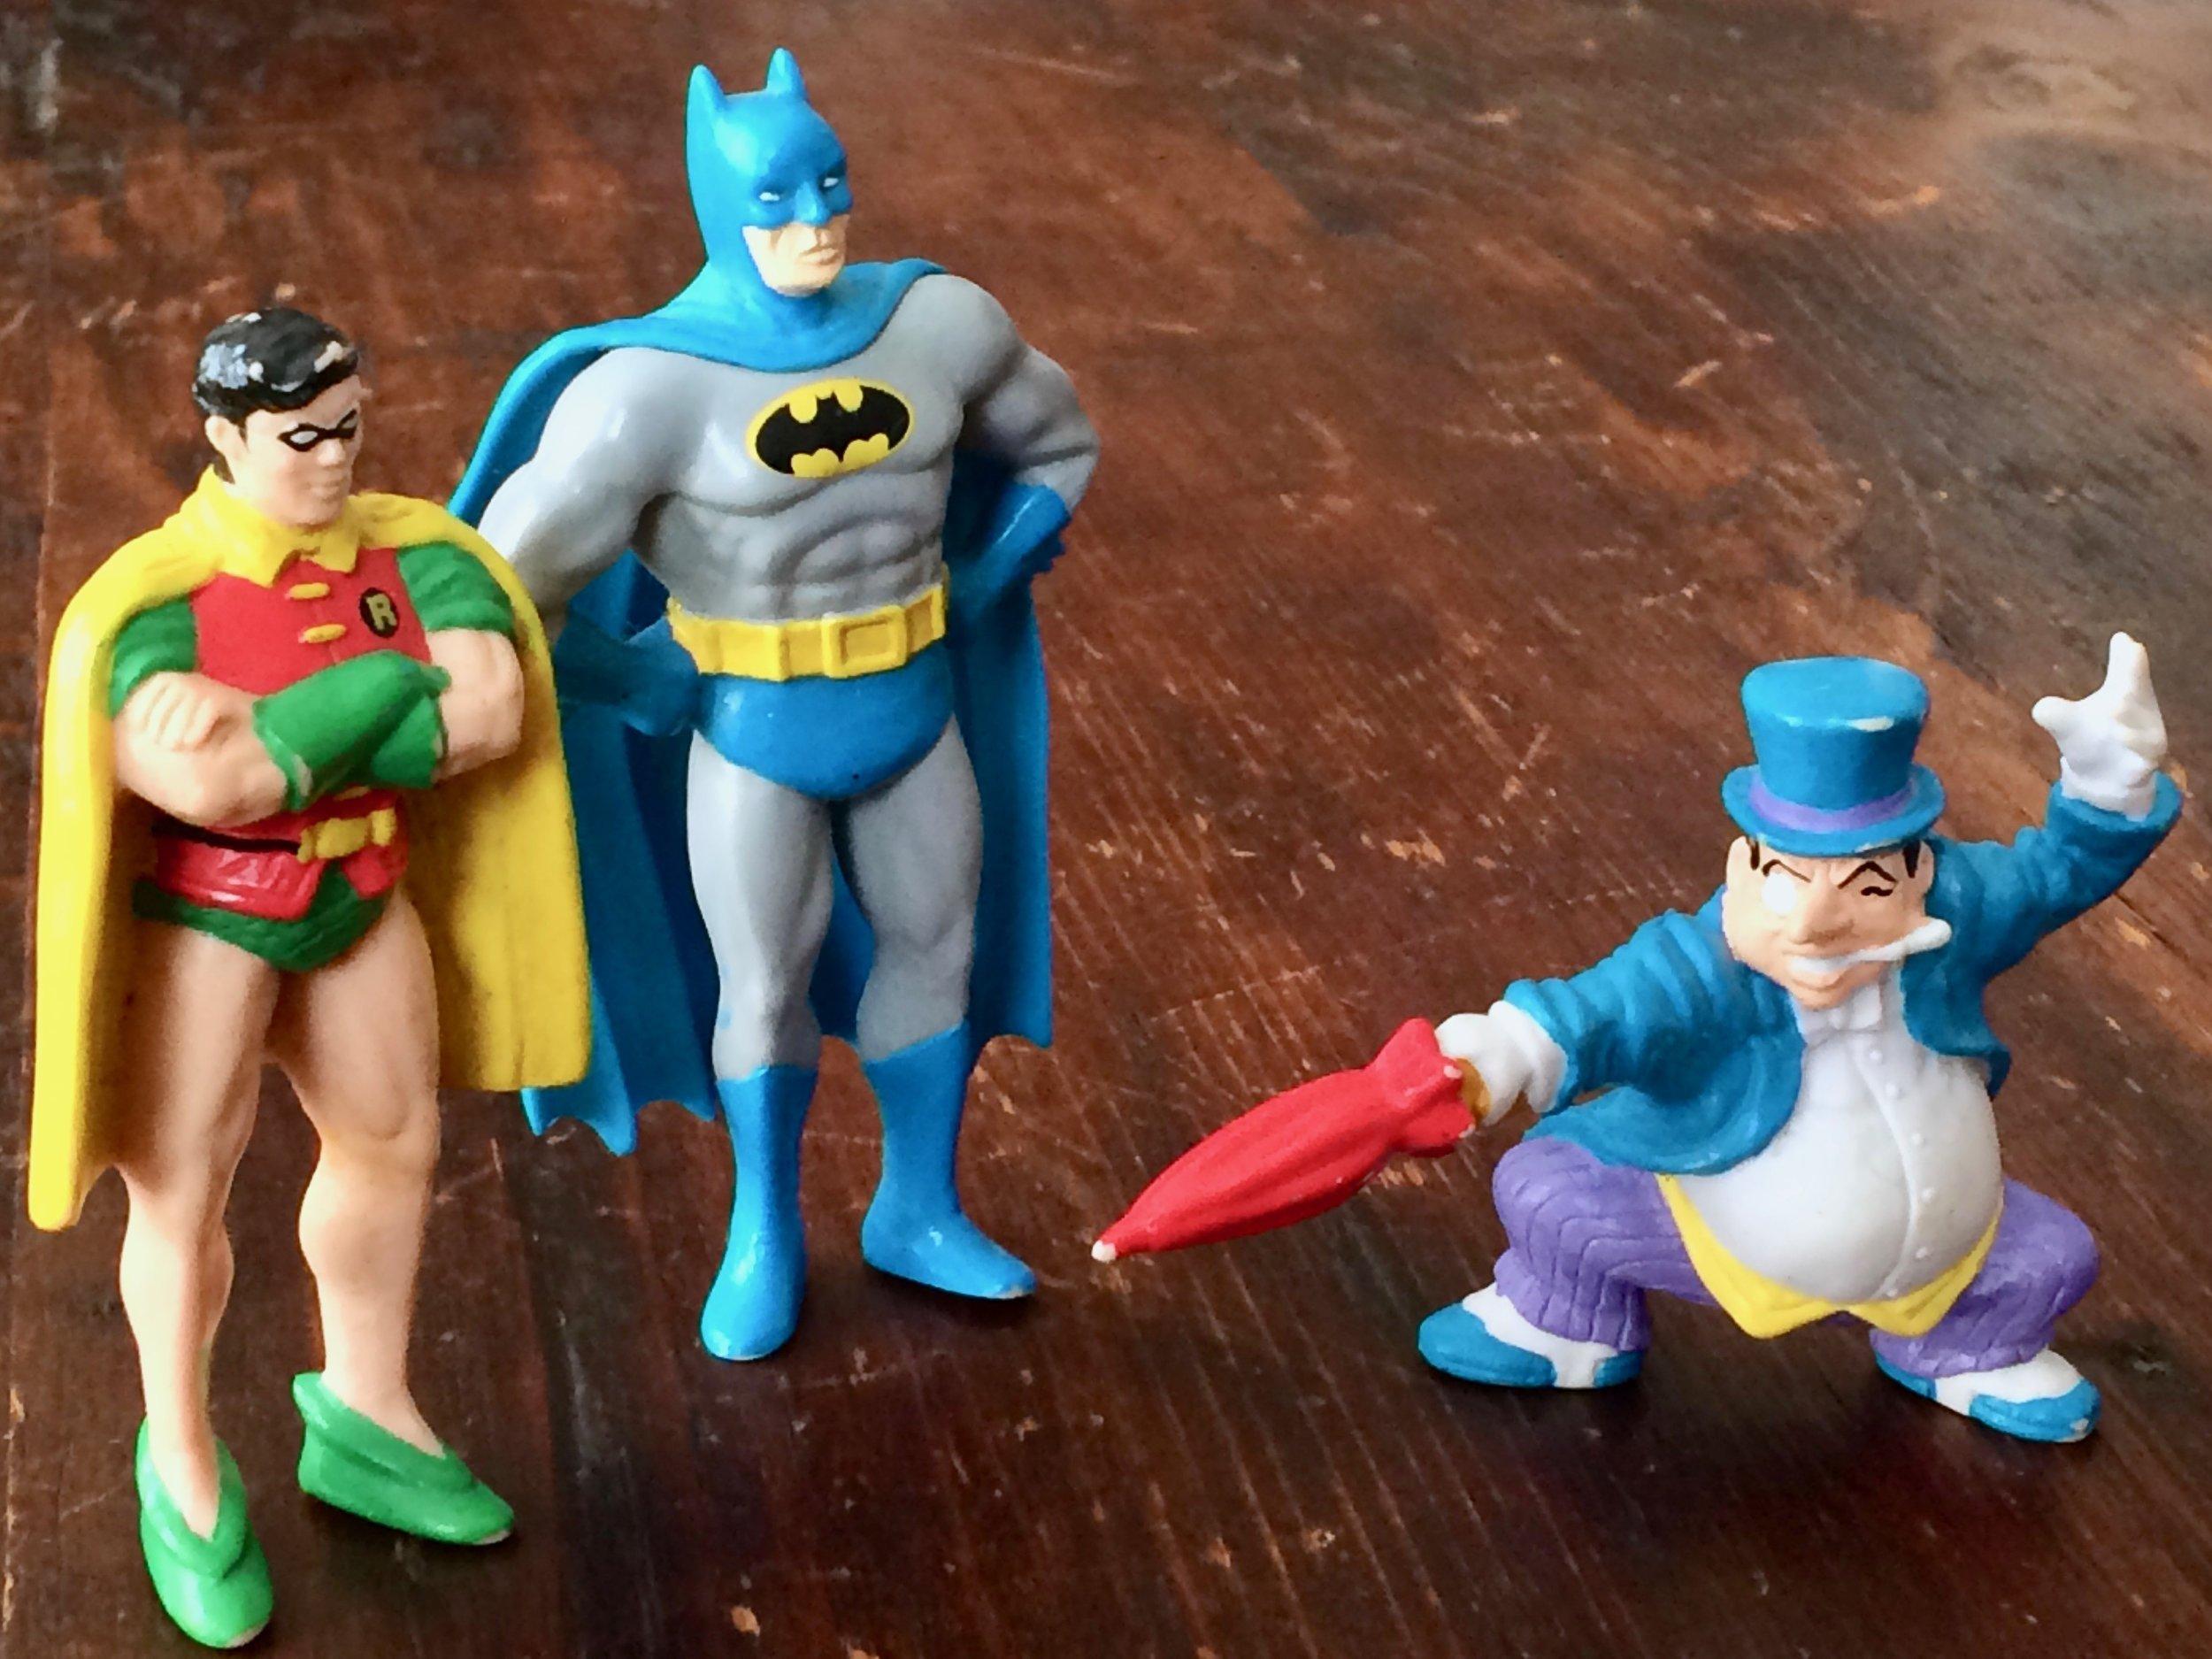 Batman Toy Figures